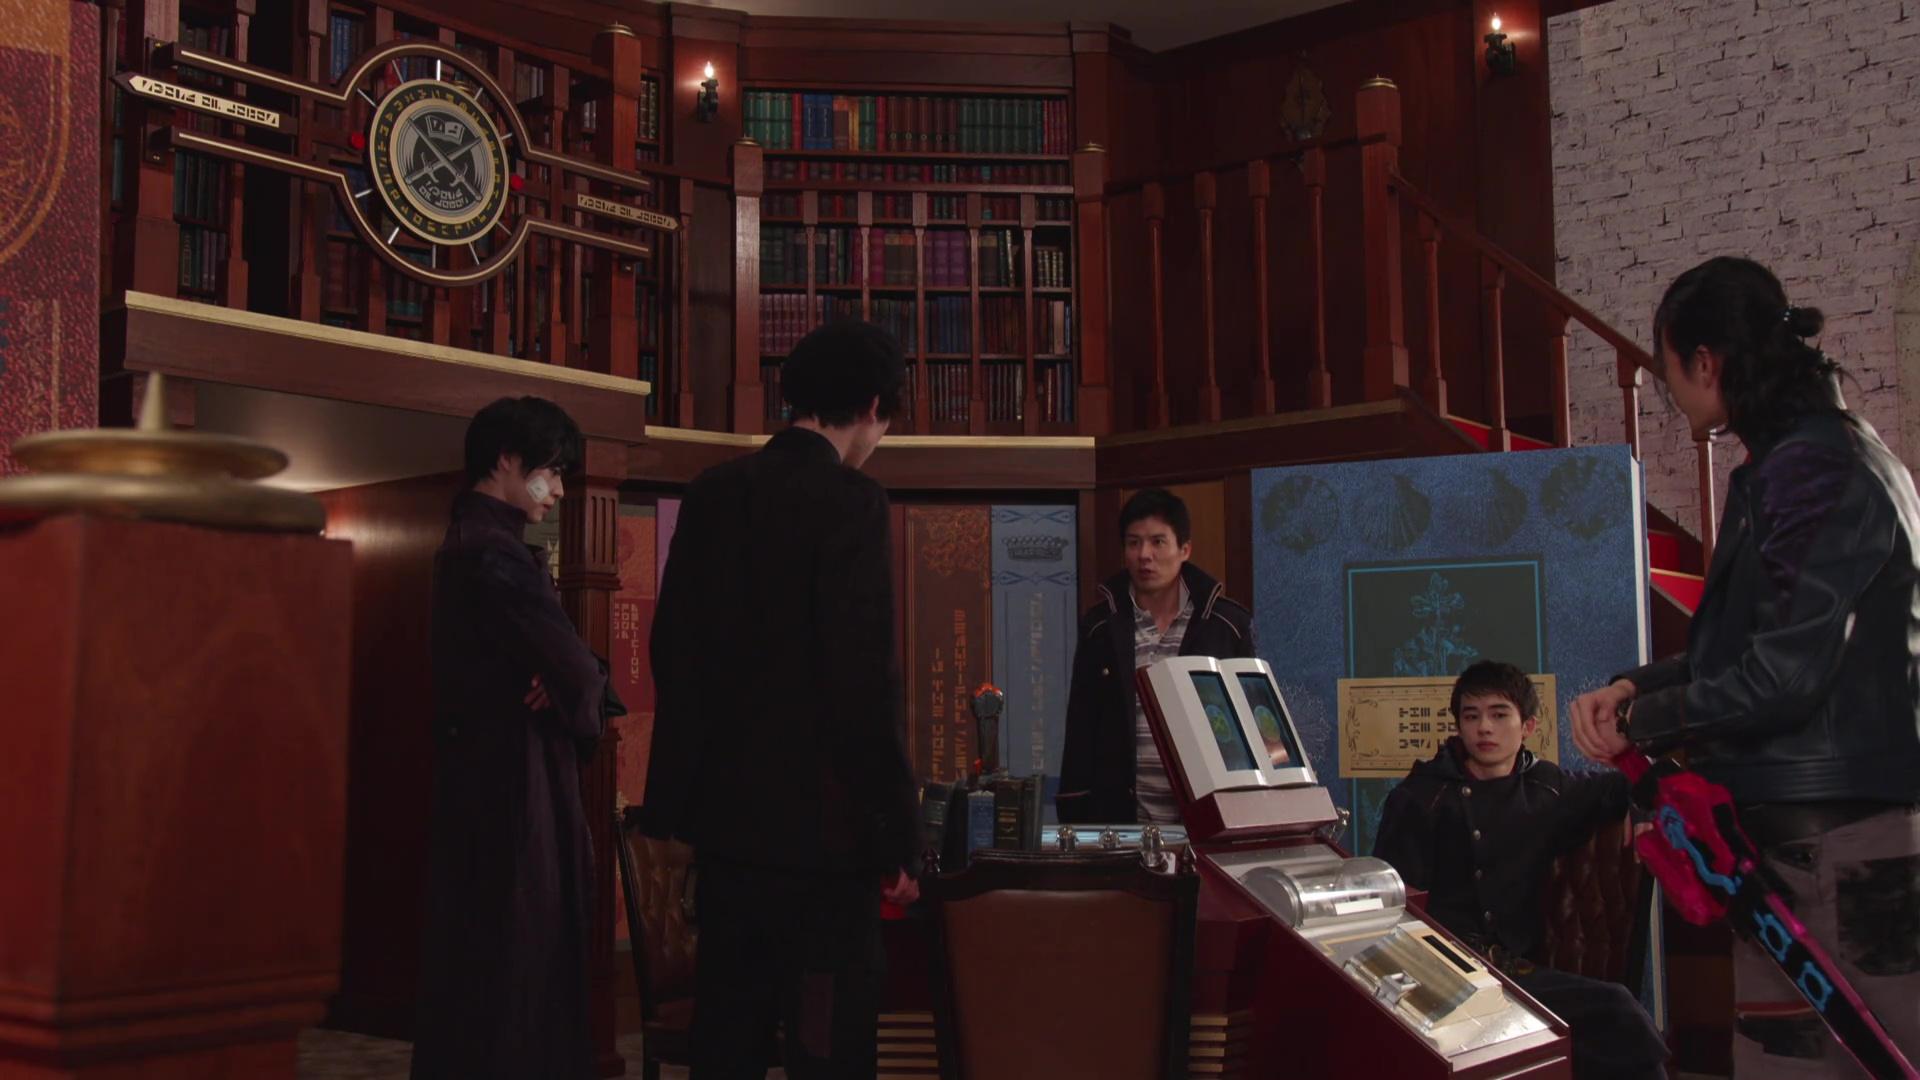 Kamen Rider Saber Episode 12 Recap